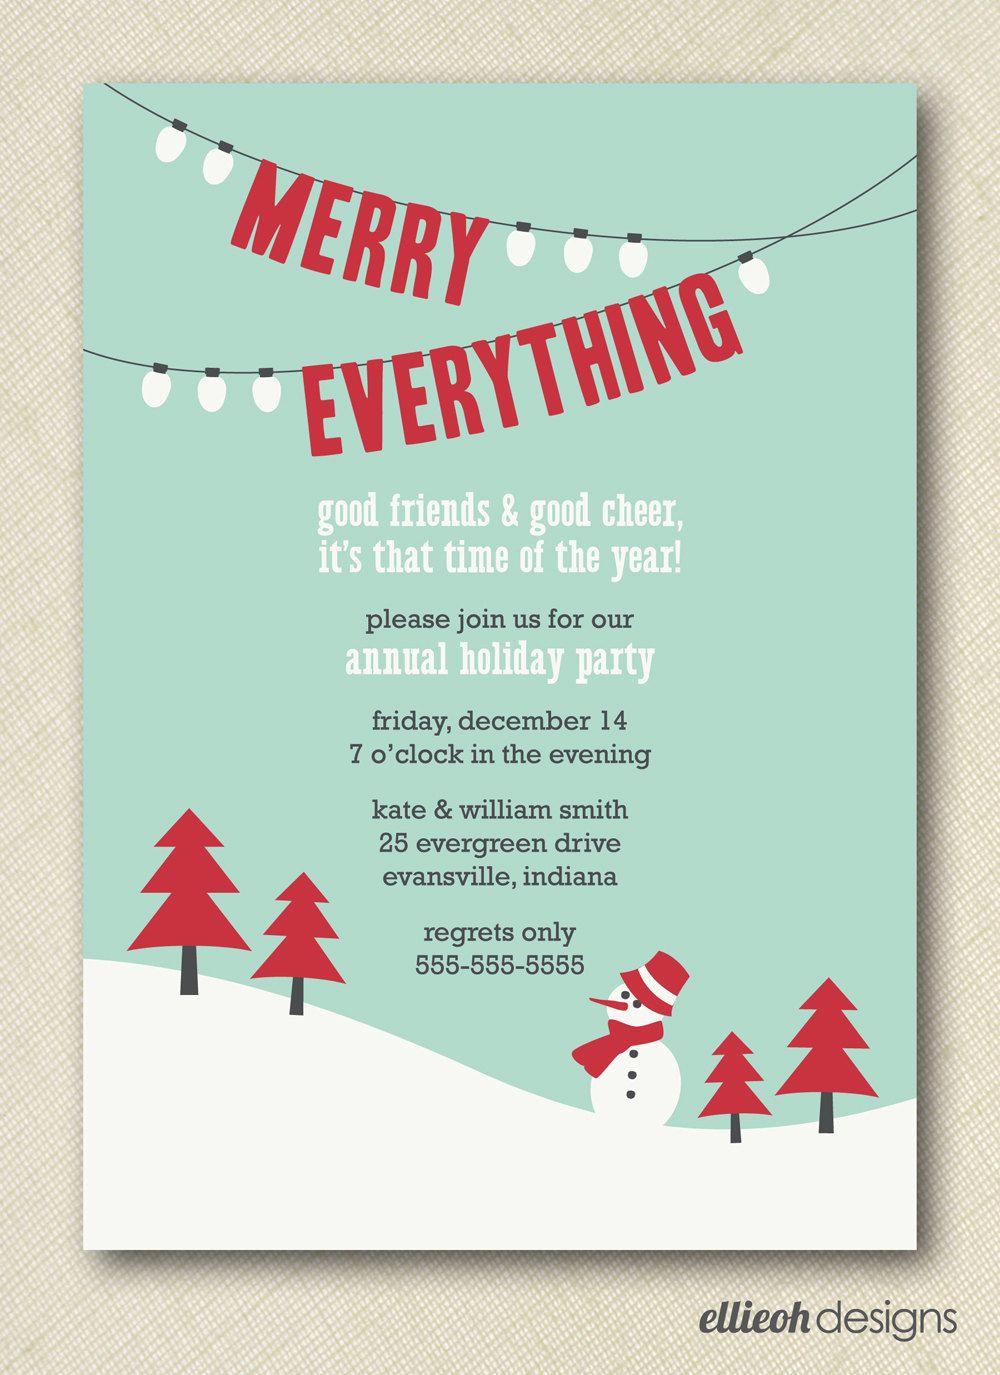 merry everything holiday party invite PRINTABLE 5x7 digital file DIY. $15.00, via Etsy.